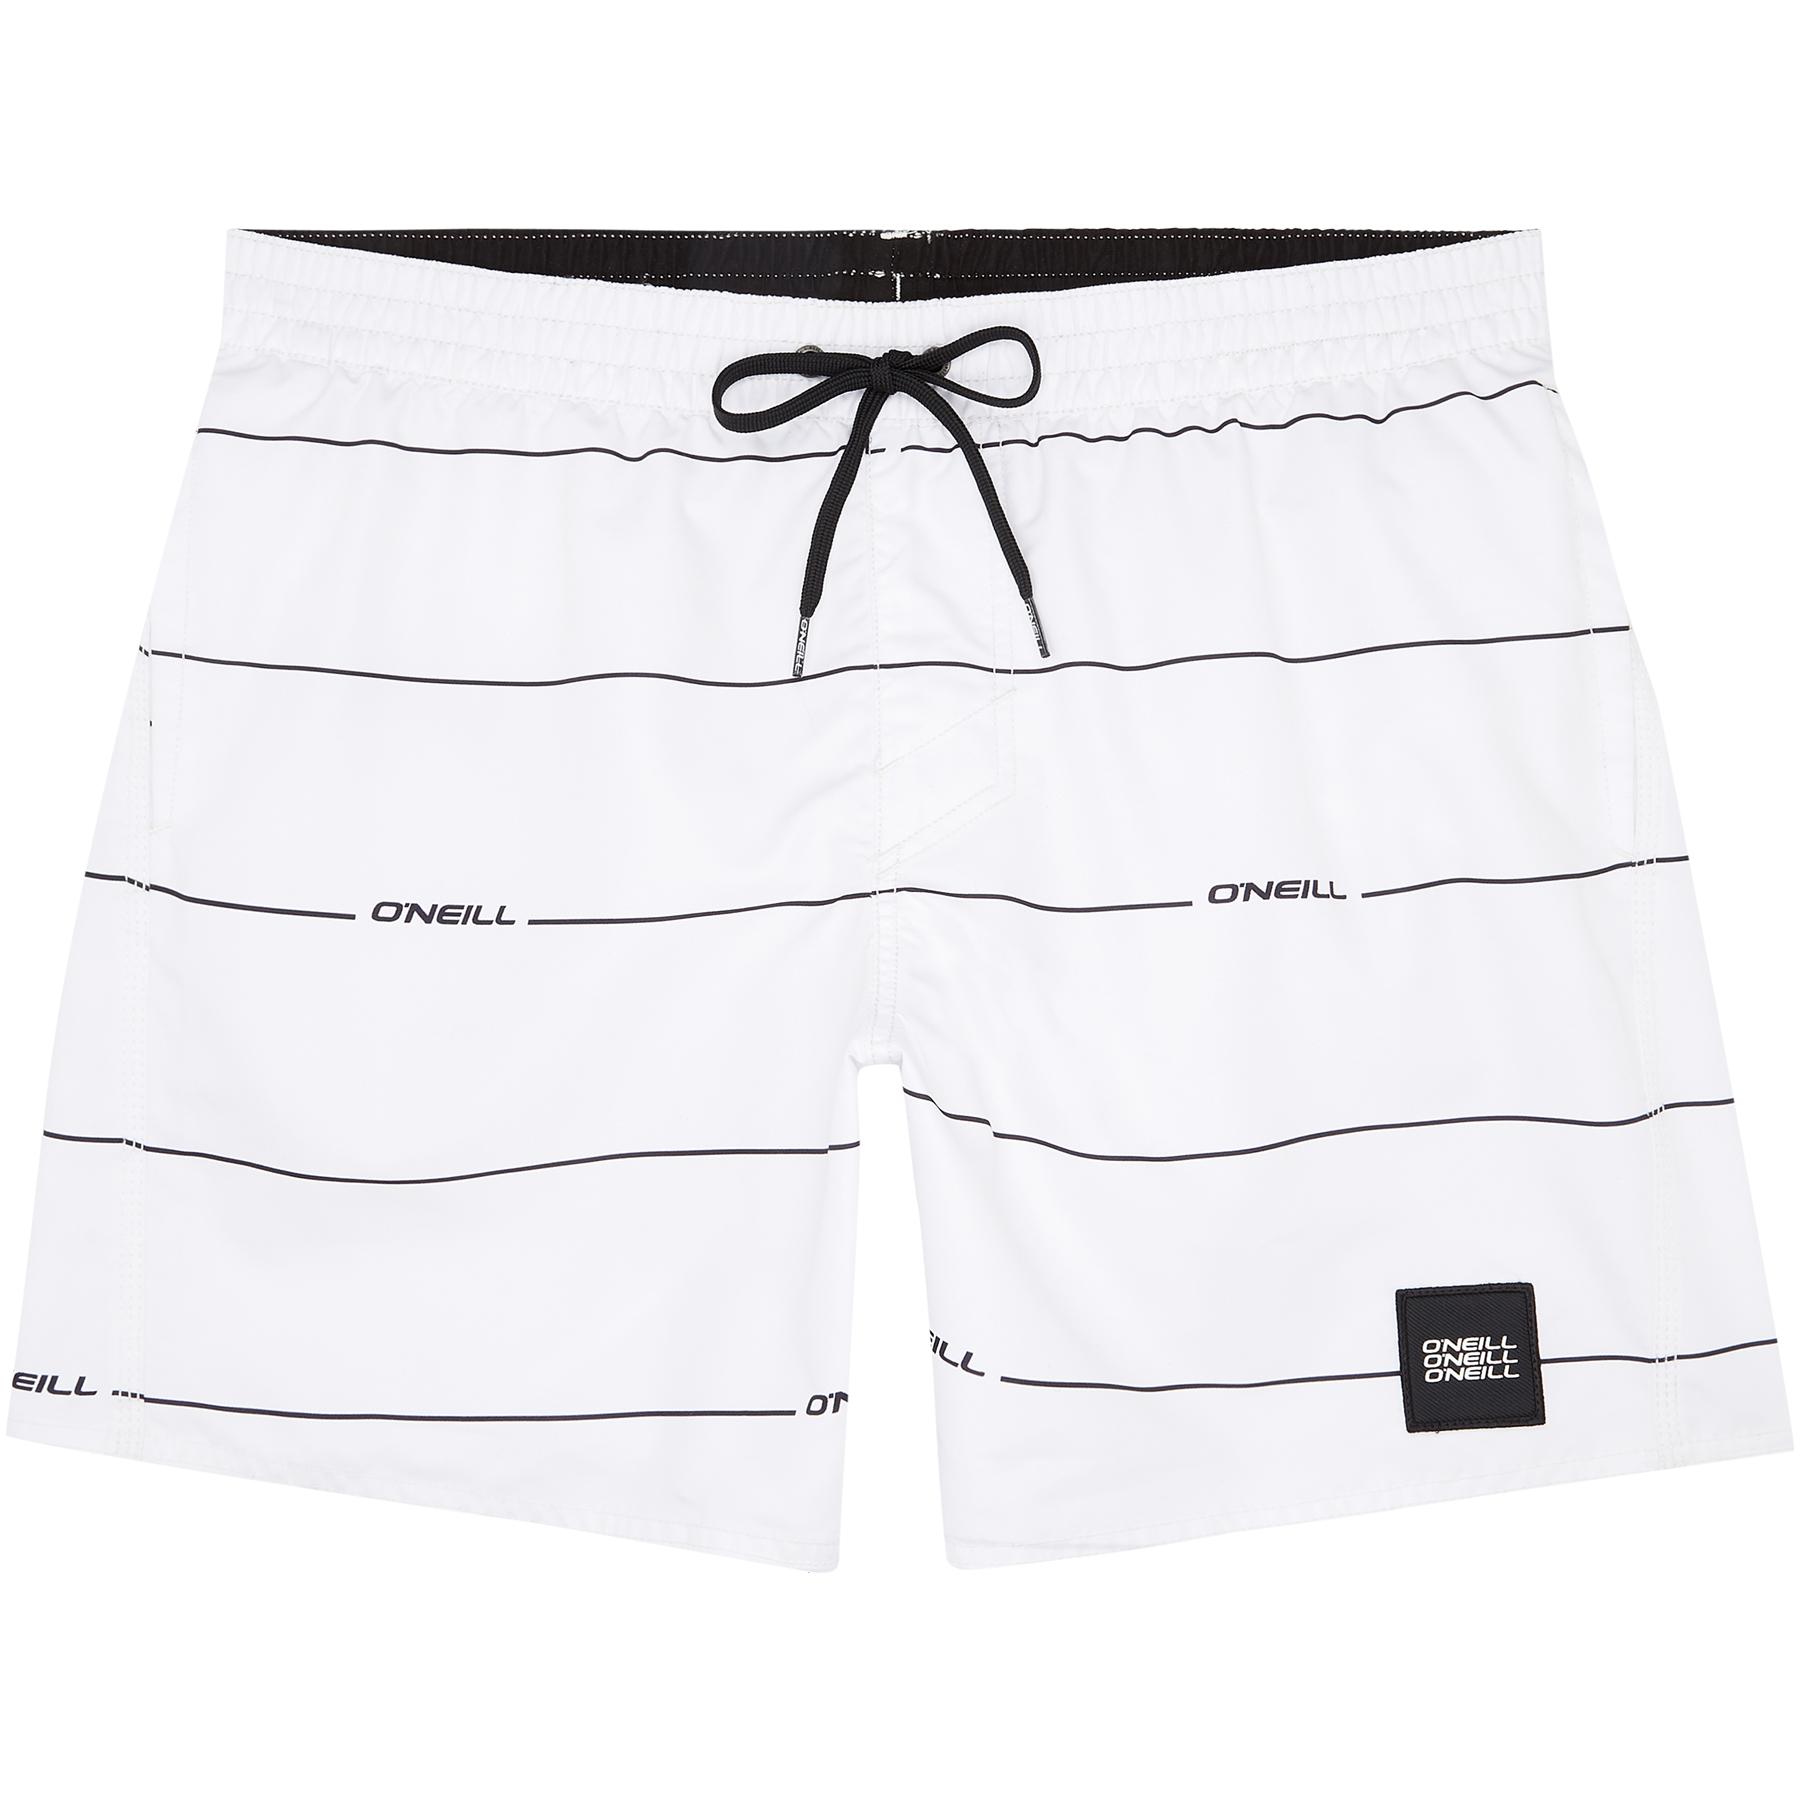 Шорты O'Neill шорты мужские o neill pm contourz shorts цвет белый черный 9a3211 1990 размер s 46 48